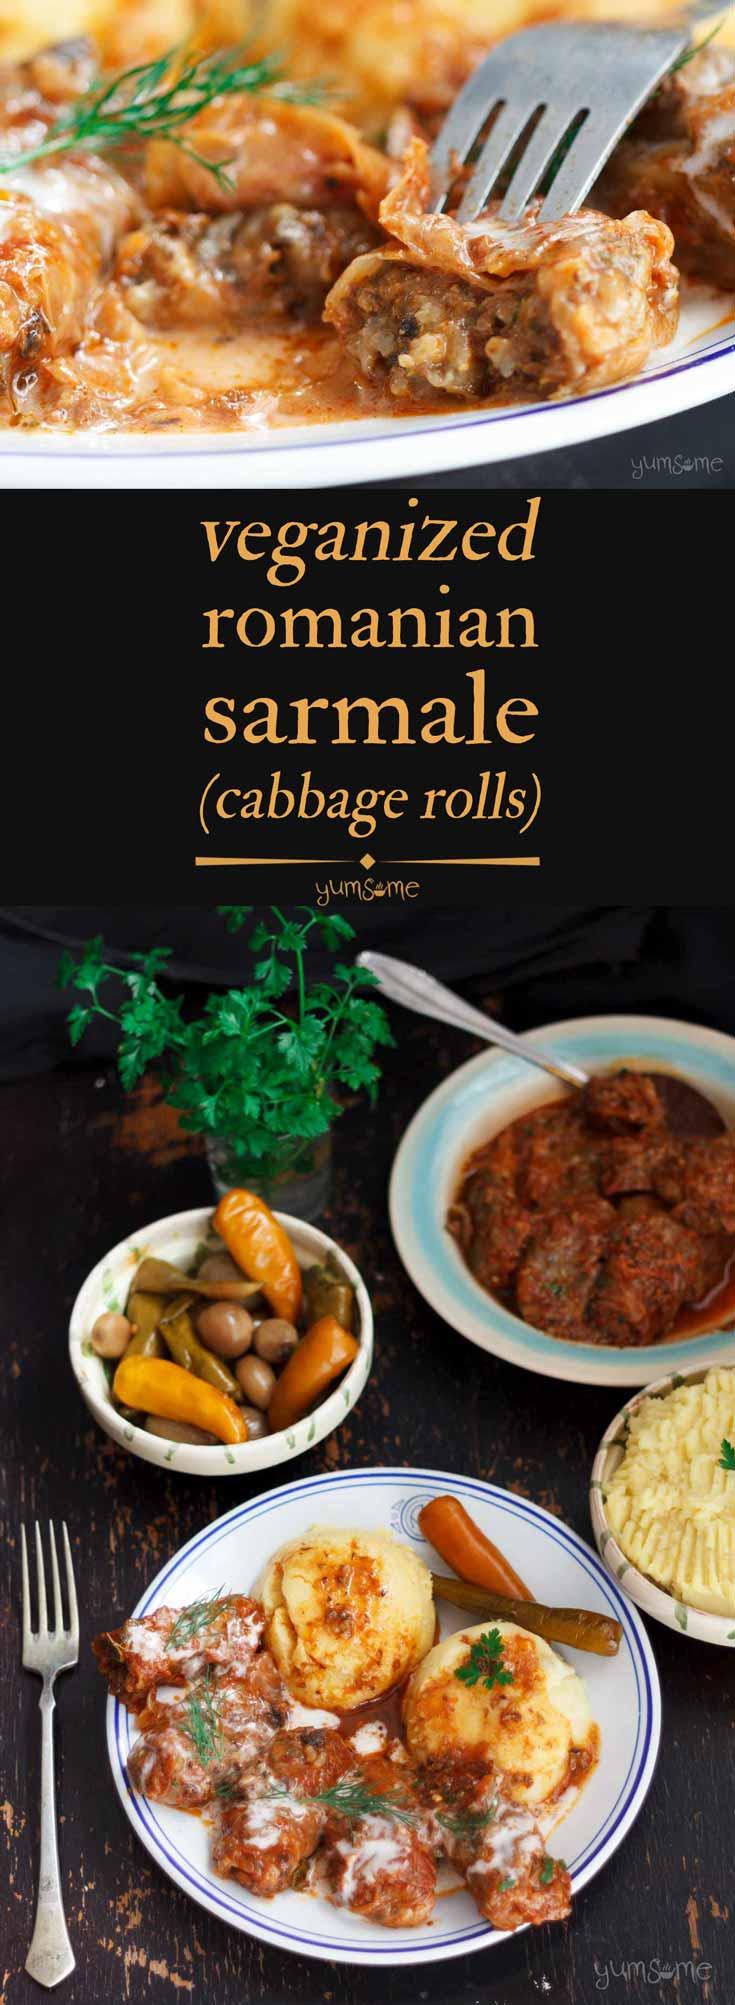 Sarmale (Stuffed Cabbage Rolls) (Vegan)